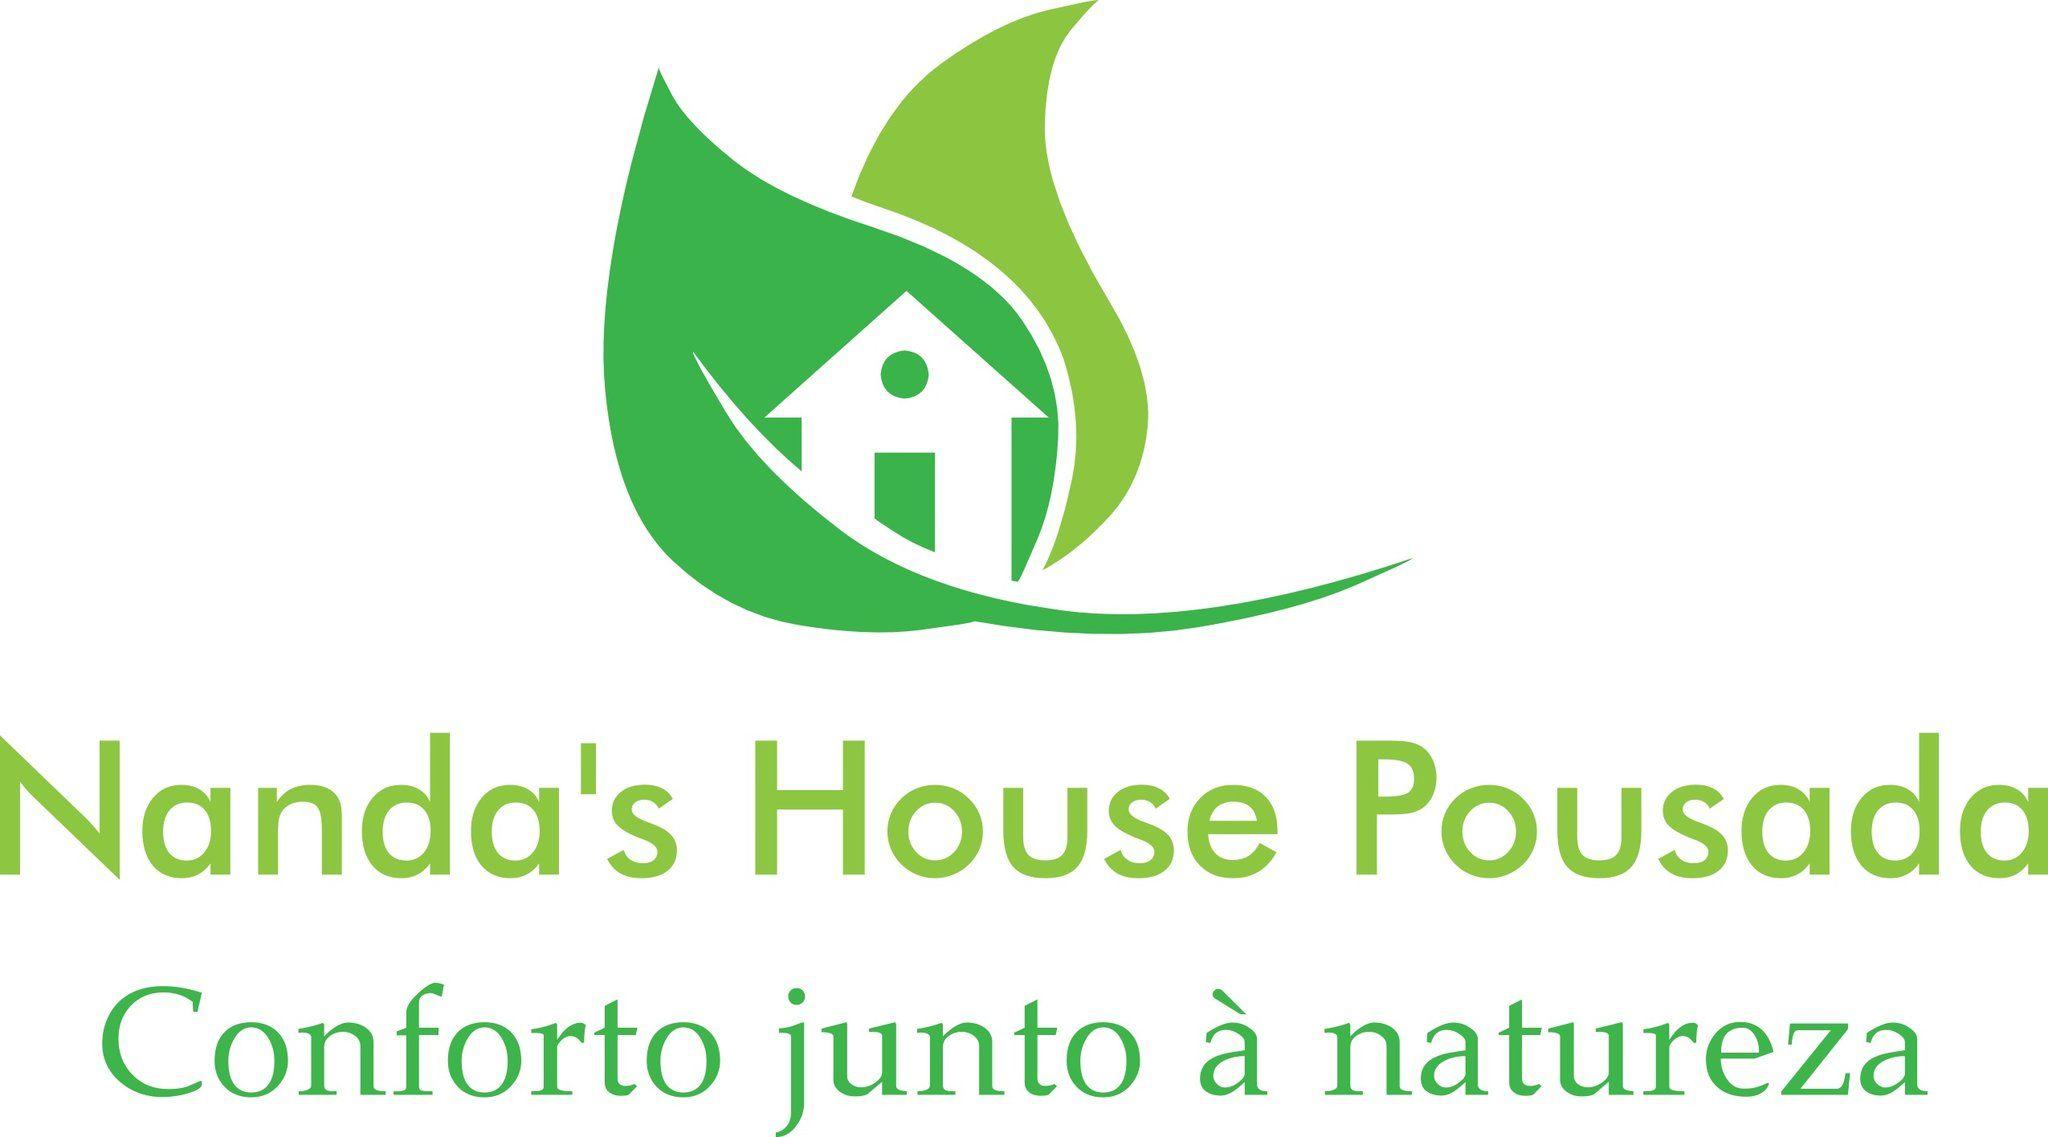 Nanda's House Pousada